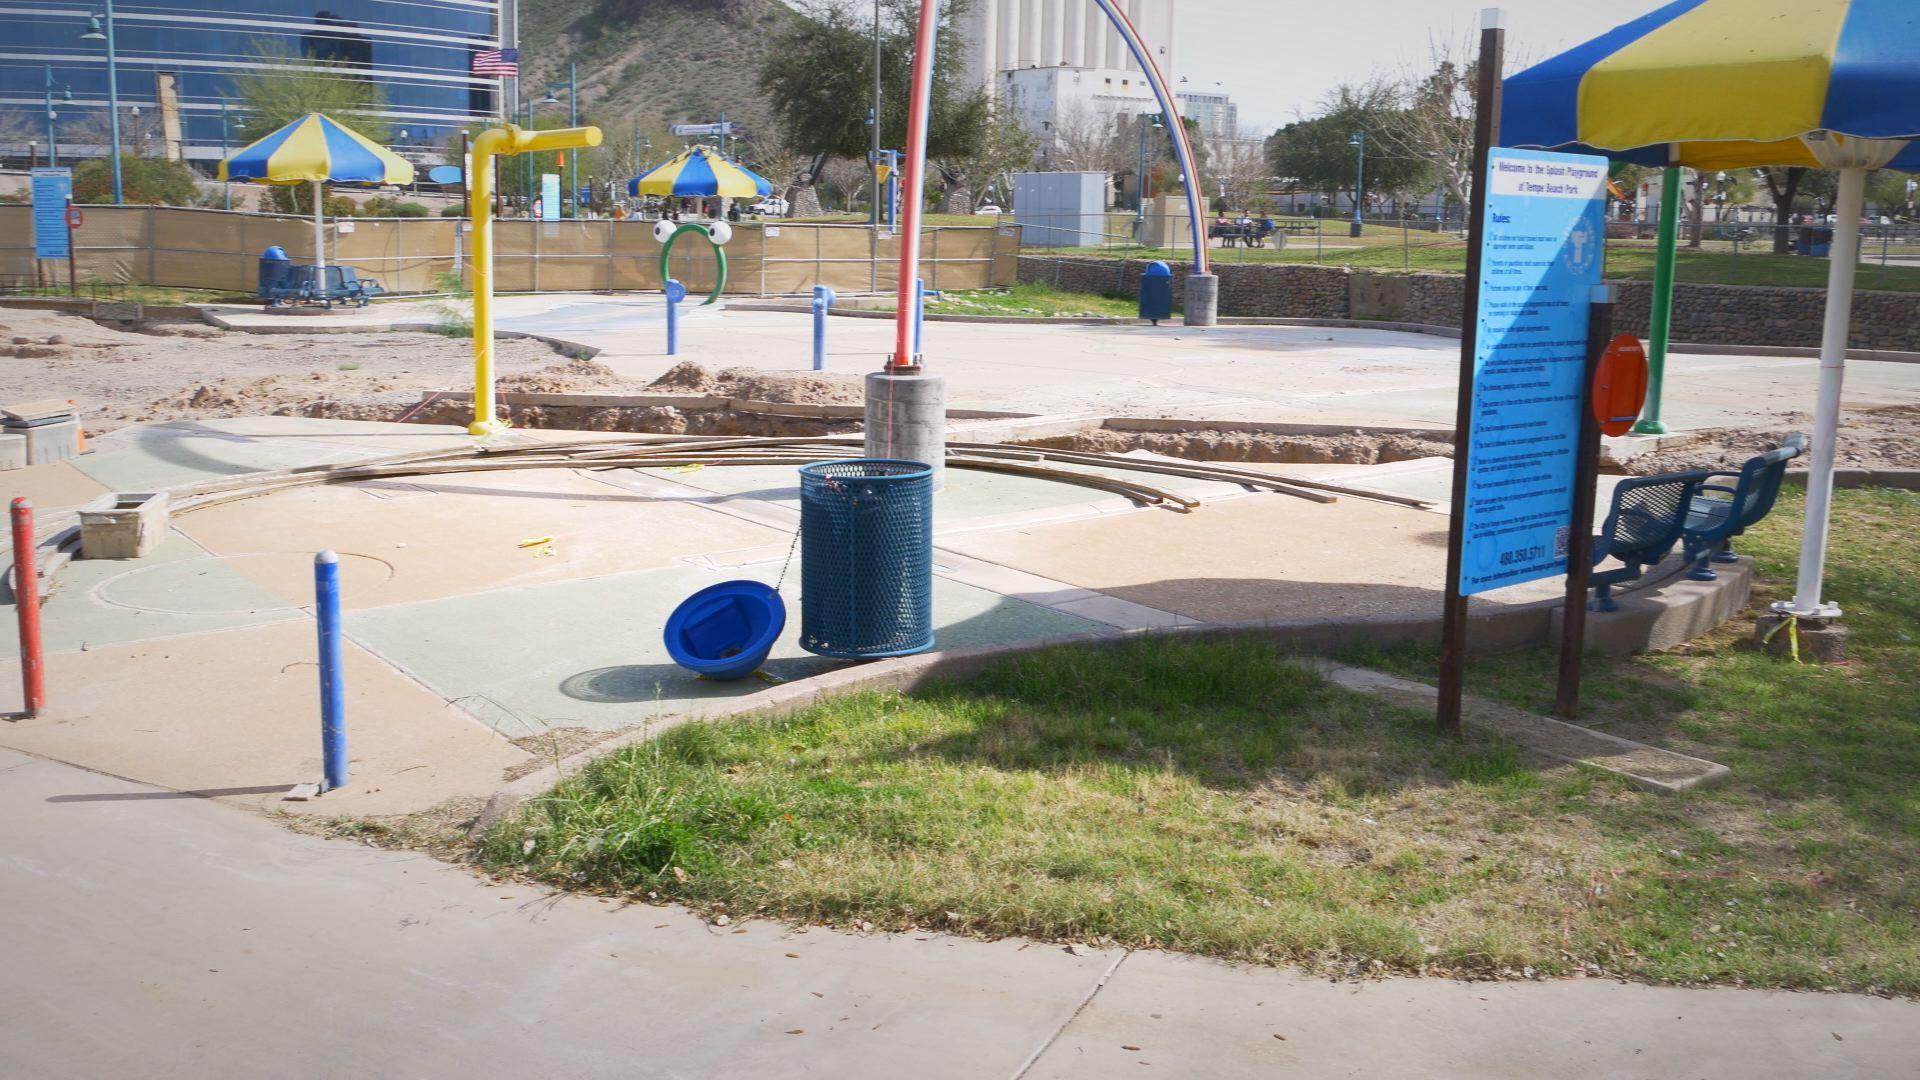 Tempe Building Splash Playground At Kiwanis Park